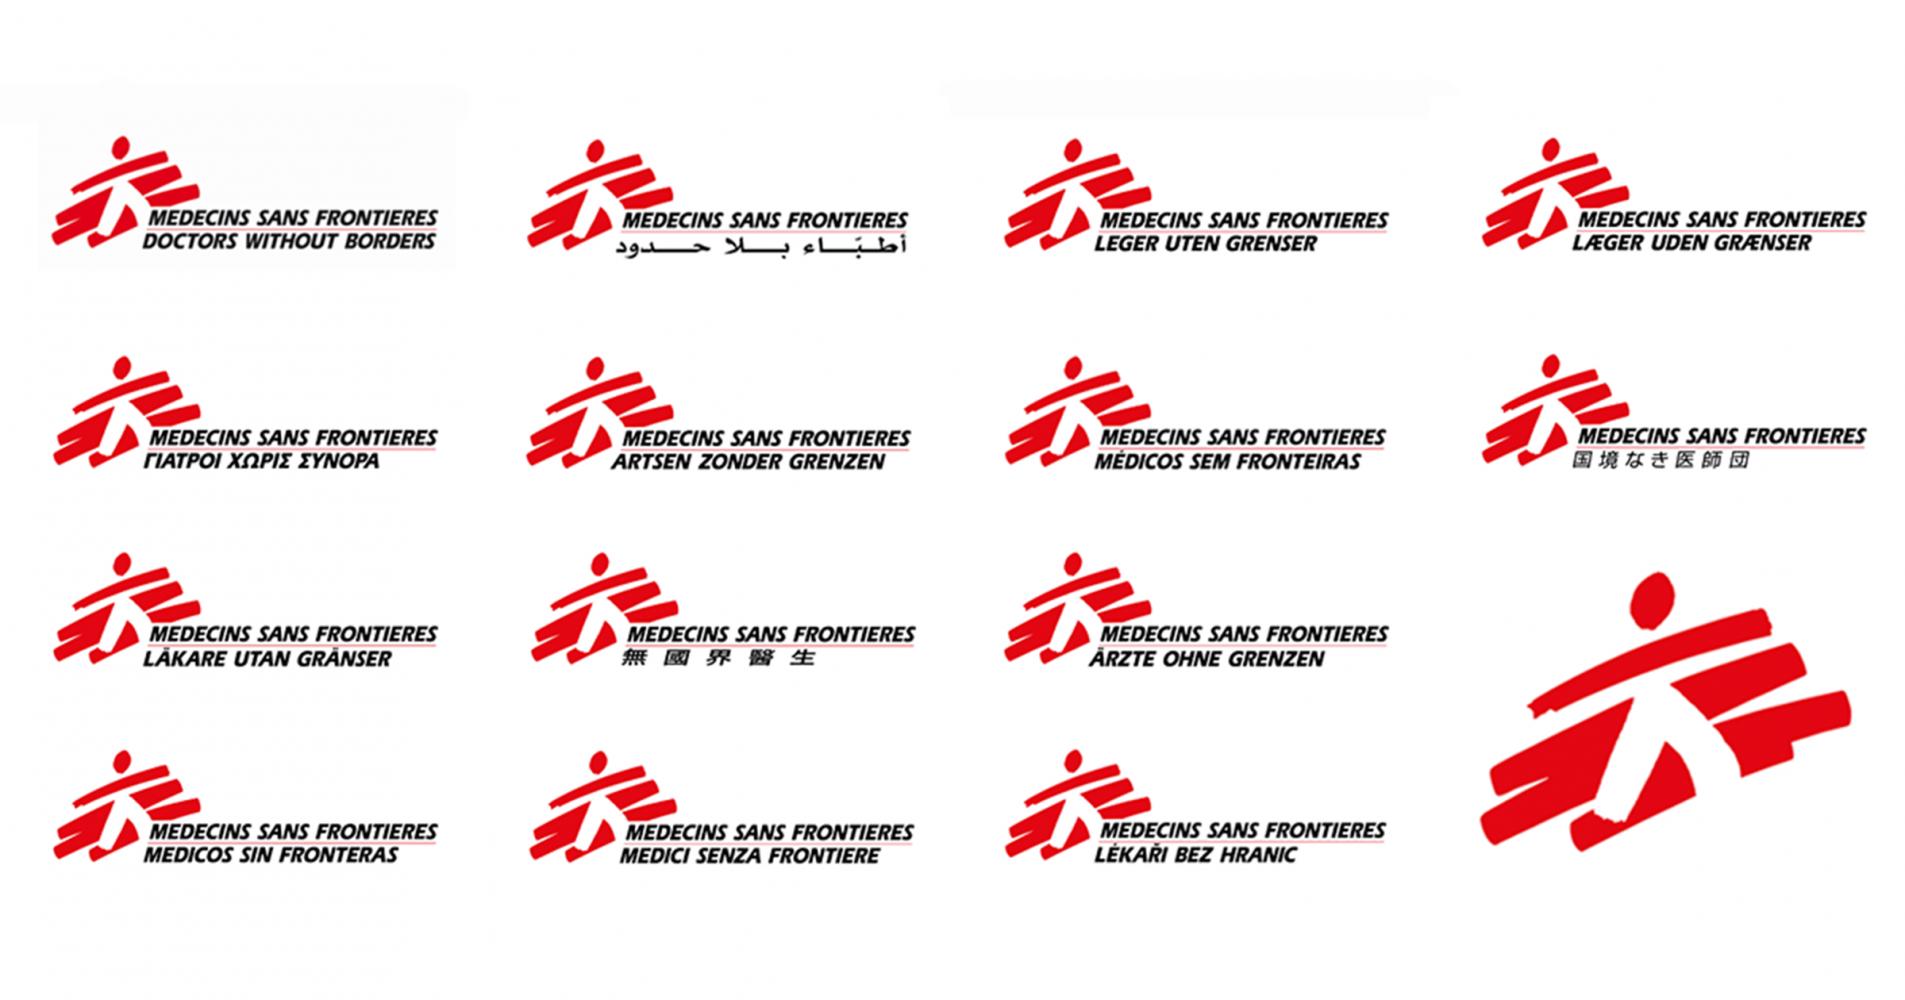 MSF Médecins Sans Frontières Doctors Without Borders logo header humanitarian designers